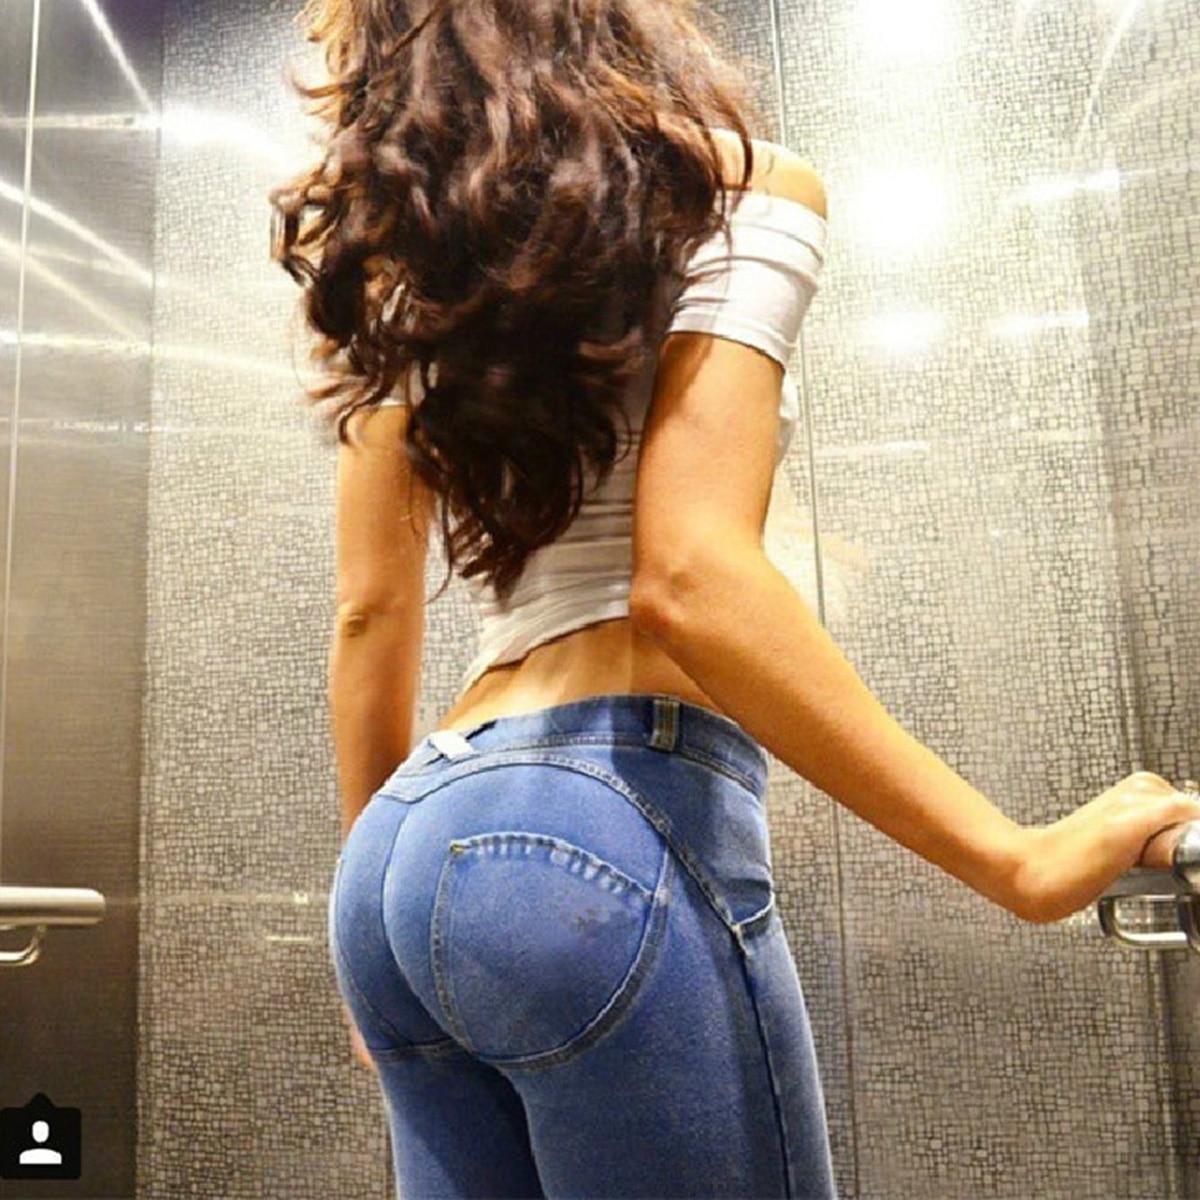 Fashion Summer Autumn Denim Push Up Slim Jeans Woman Bodycon Honey Peach Hip Elastic Waist Stretch Jeans Sexy Skinny Denim Pants